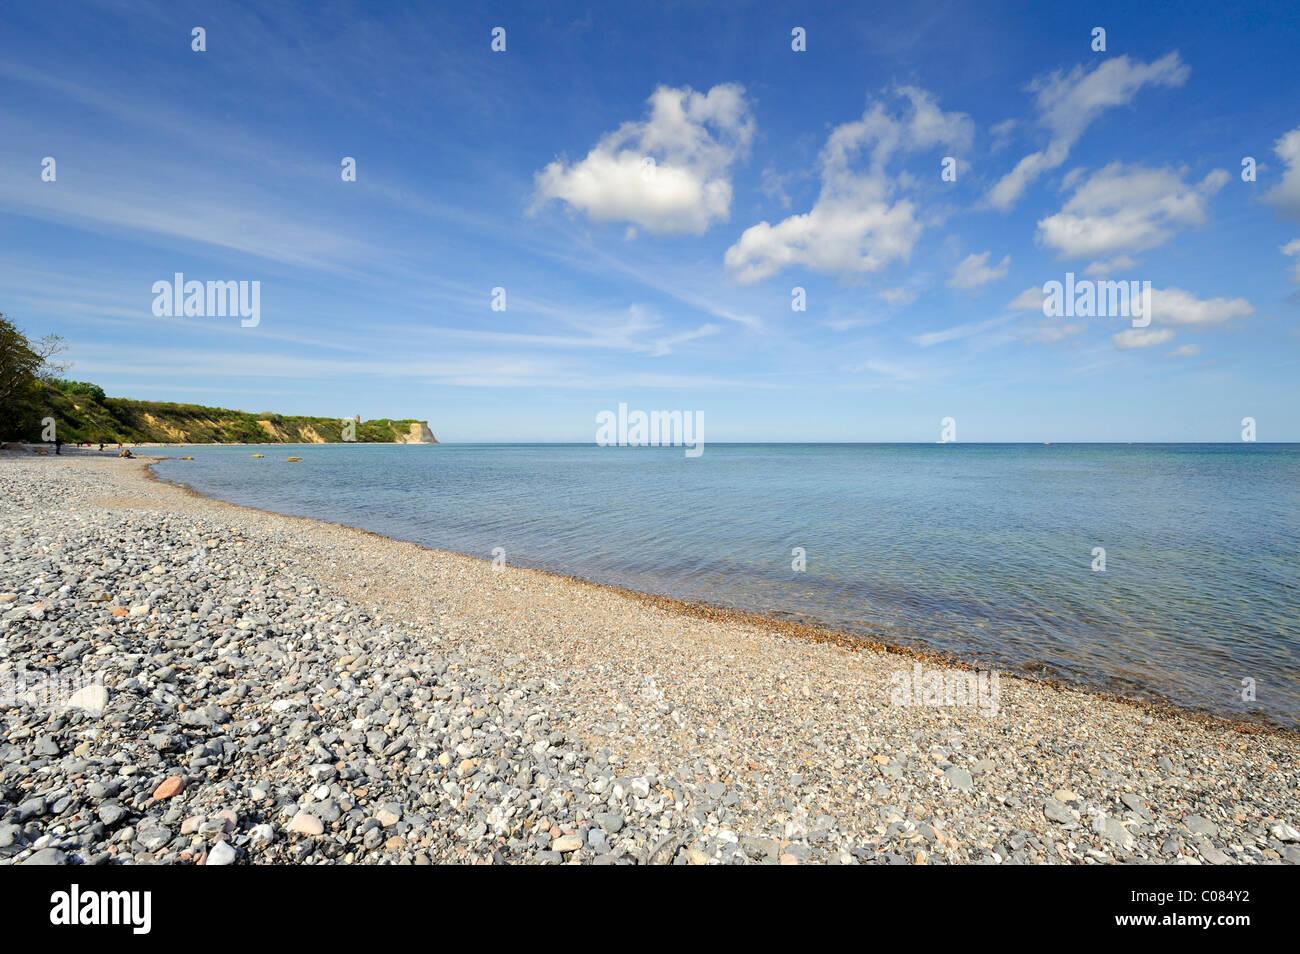 Gravel beach from flint stones, near fishing village Vitt with views of Cape Arkona, Ruegen Island - Stock Image